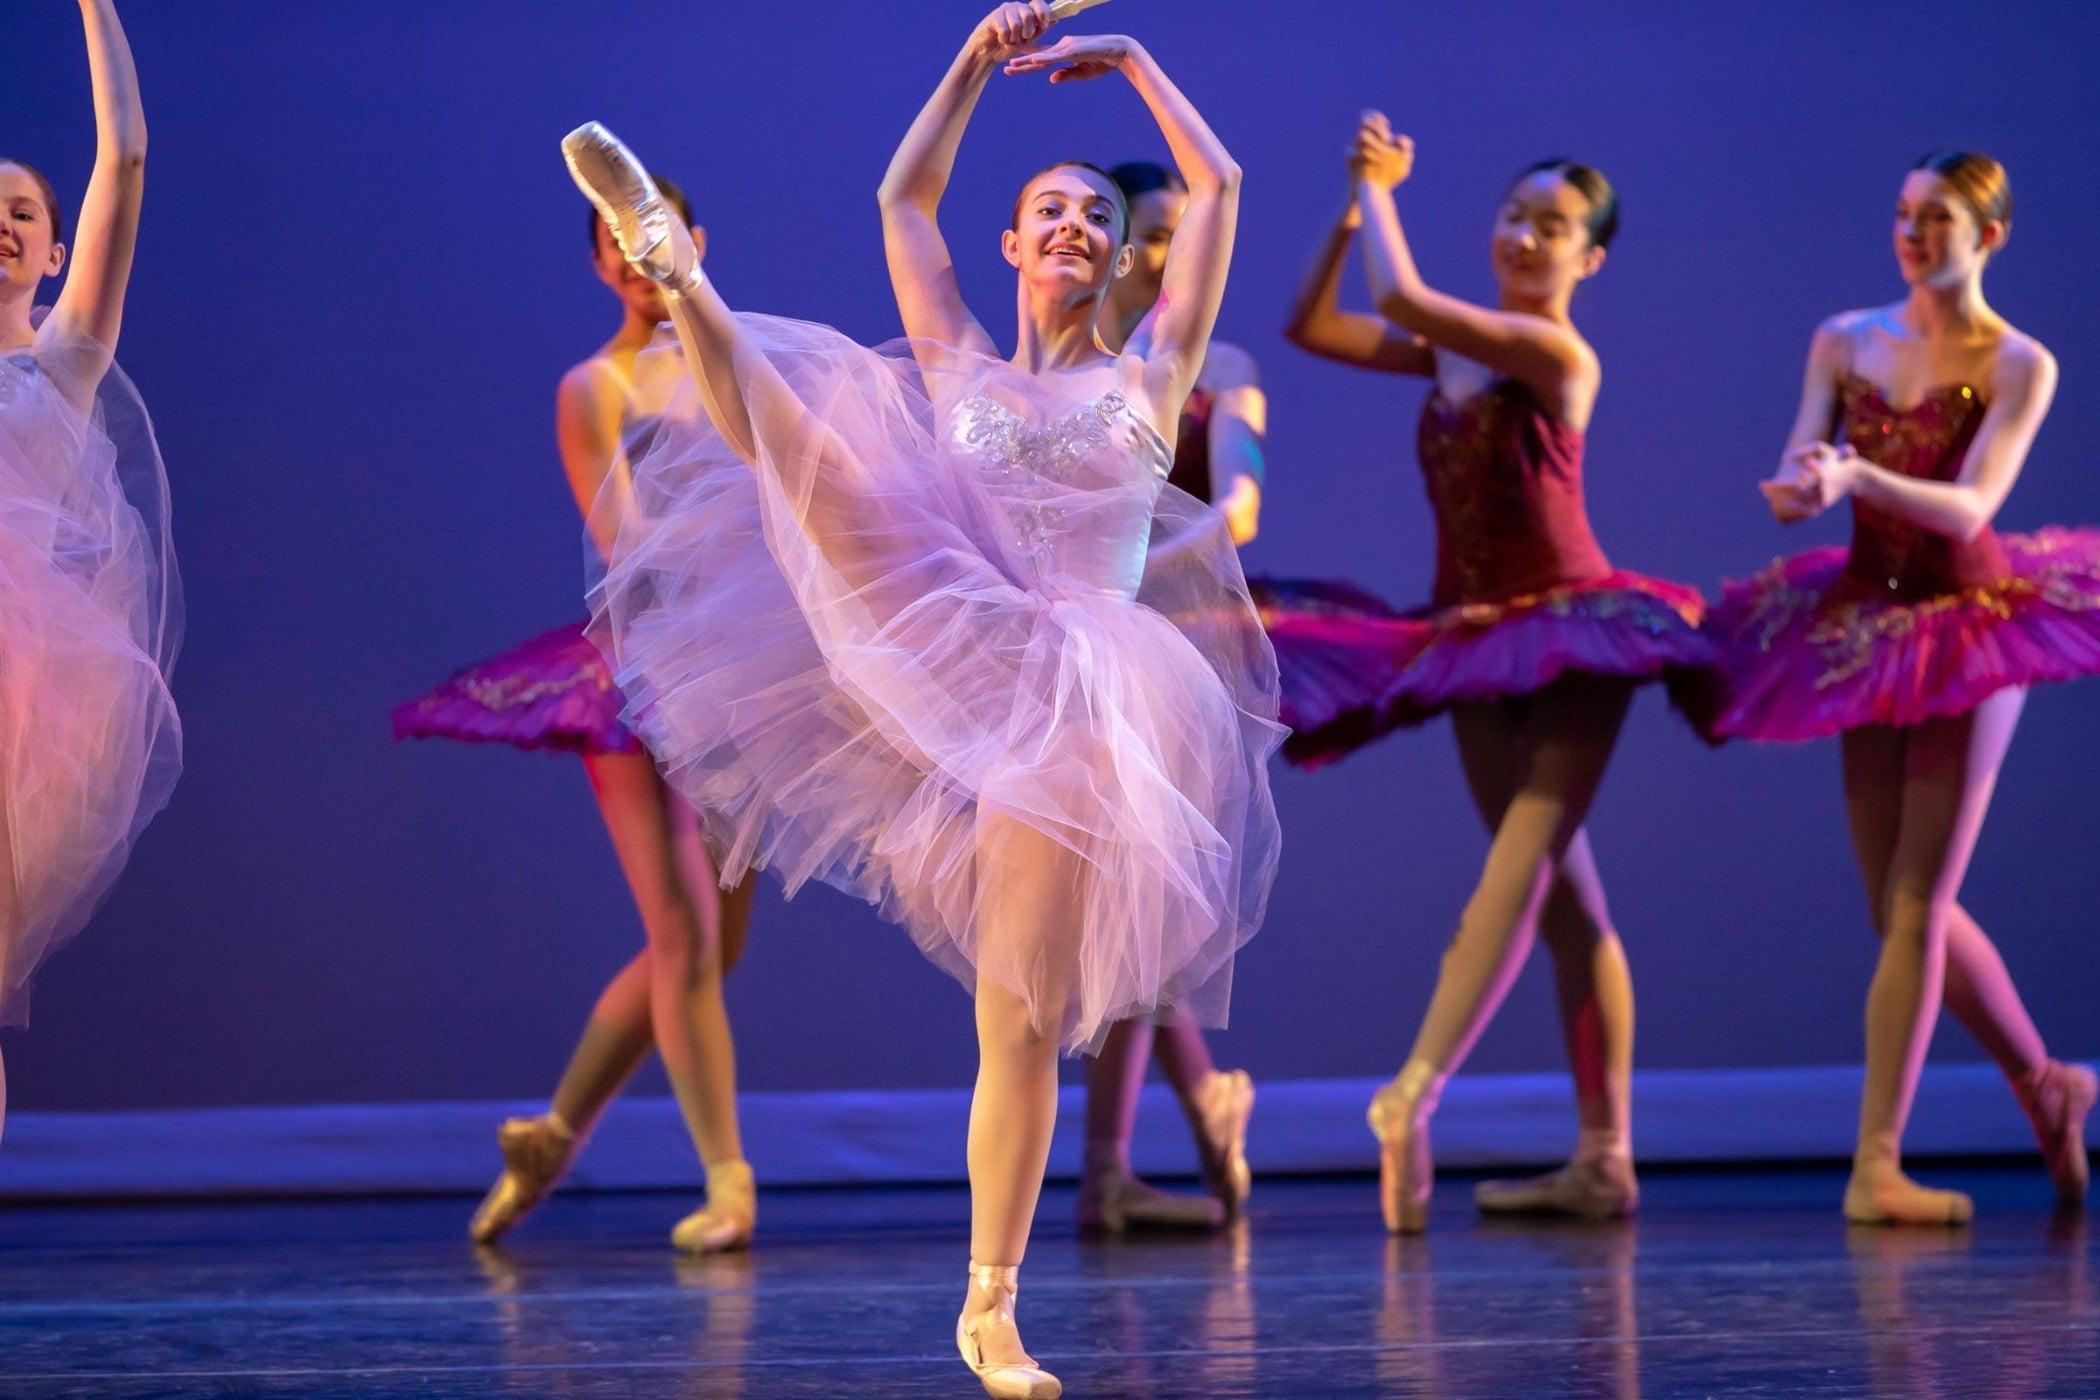 Ballet shoe, Performing arts, Clothing, Dance, Entertainment